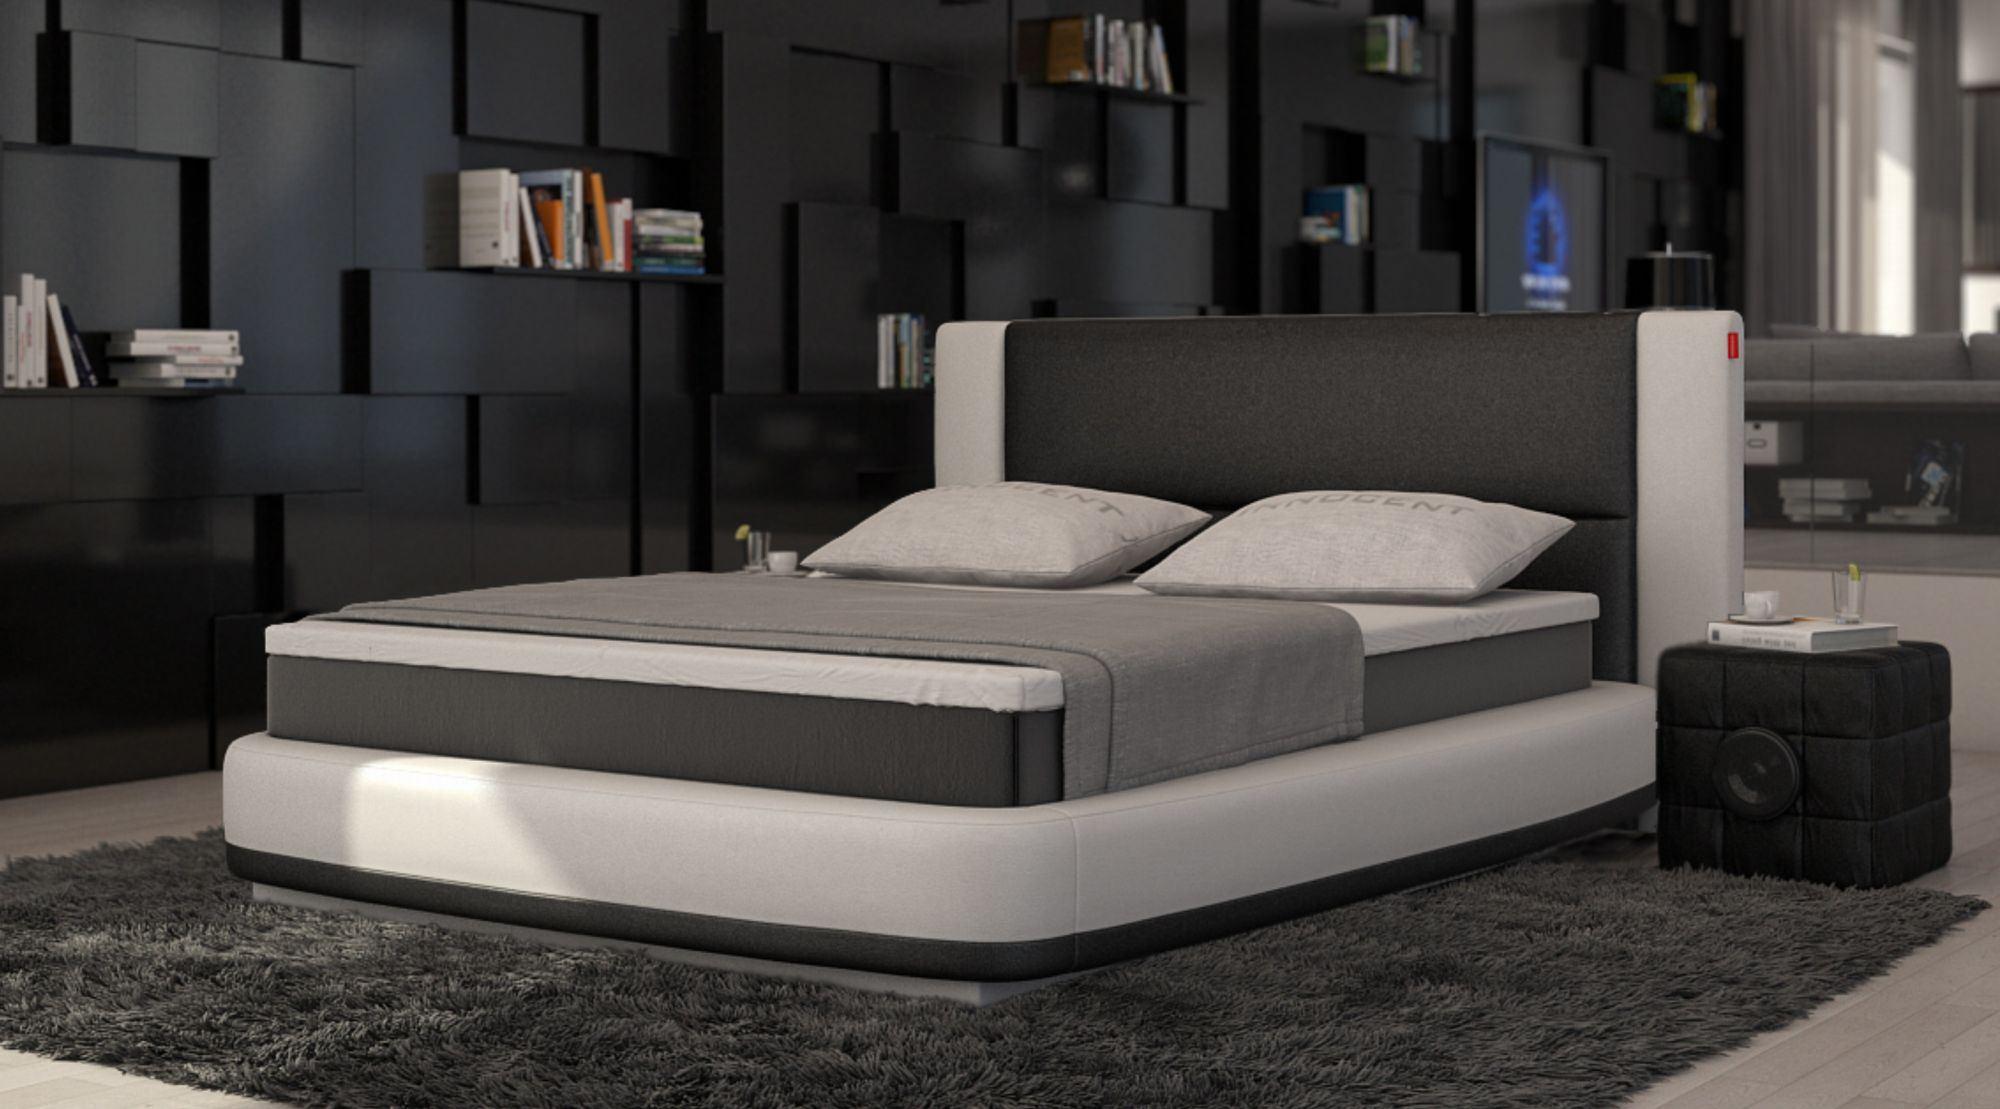 Boxspringbett AQUILA Design Luxus Polsterbett Bequemes